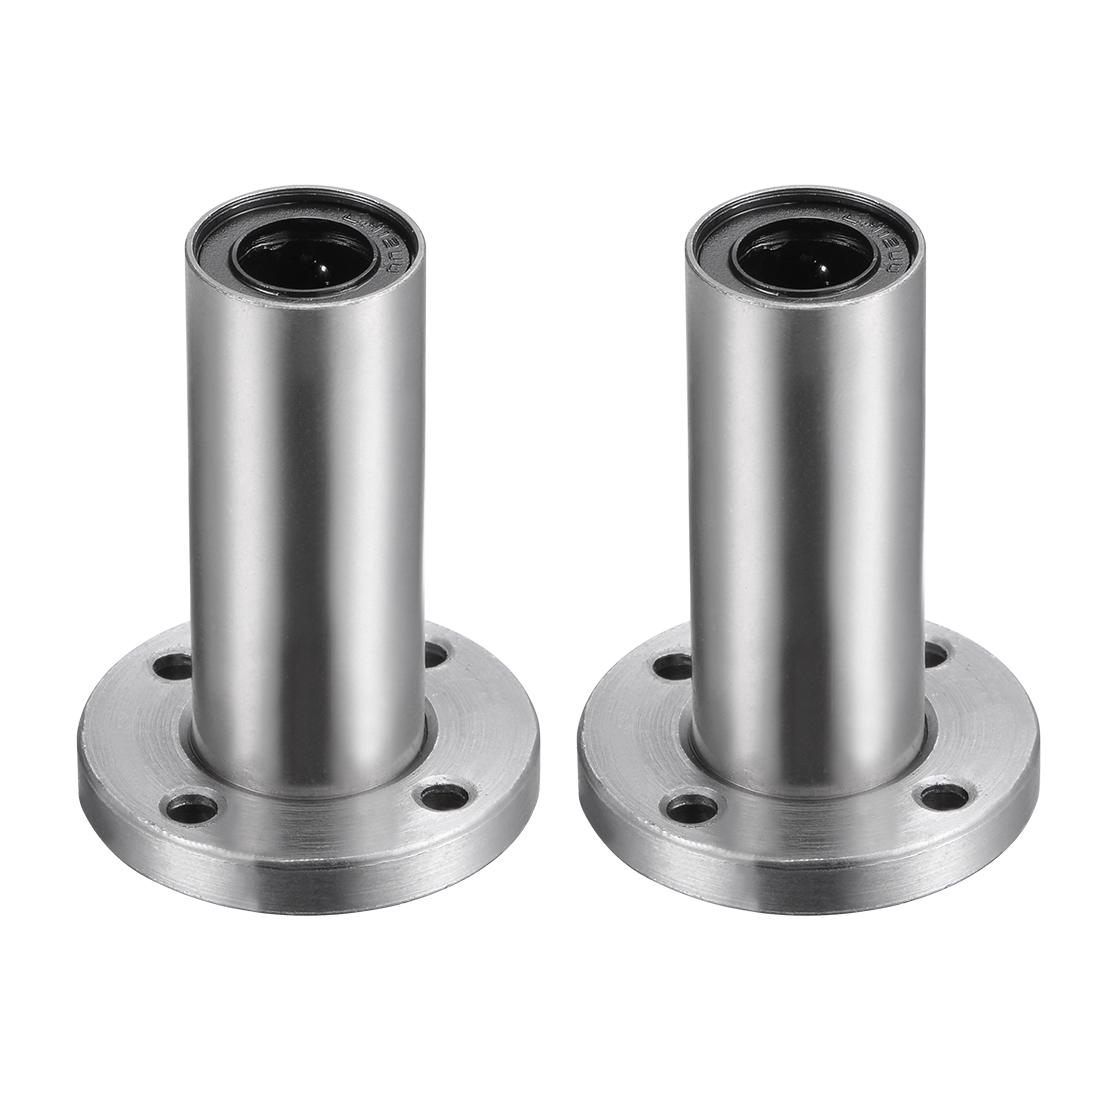 12mm Linear Ball Bearings Round Flange LMF12LUU 12mm Bore 21mm OD 57mm Long 2pcs